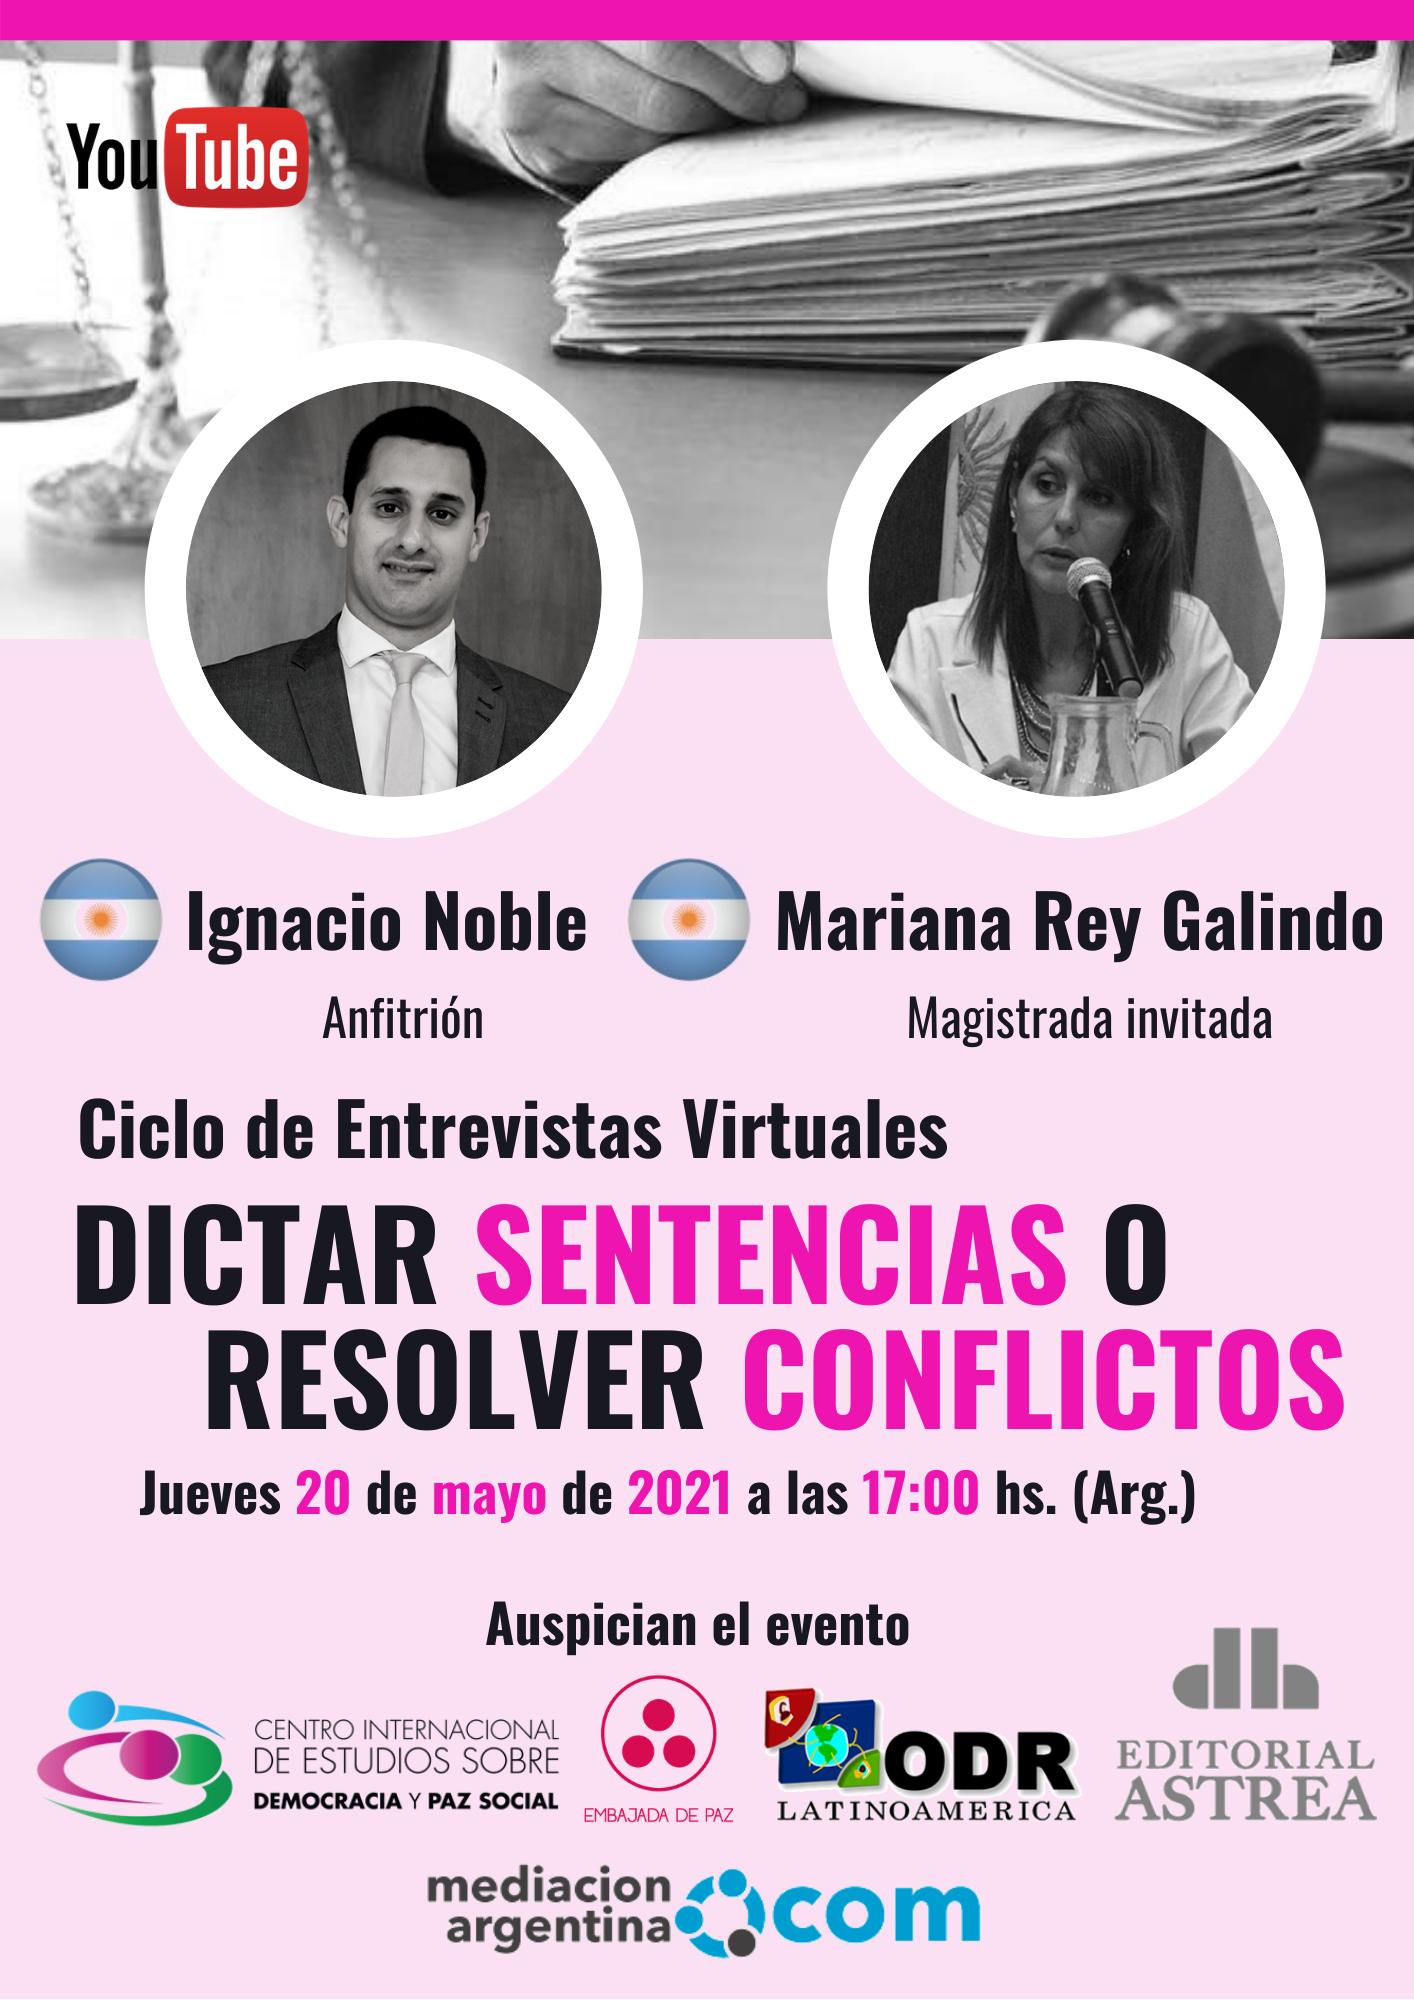 ¿Dictar sentencias o resolver conflictos? con Mariana Rey Galindo